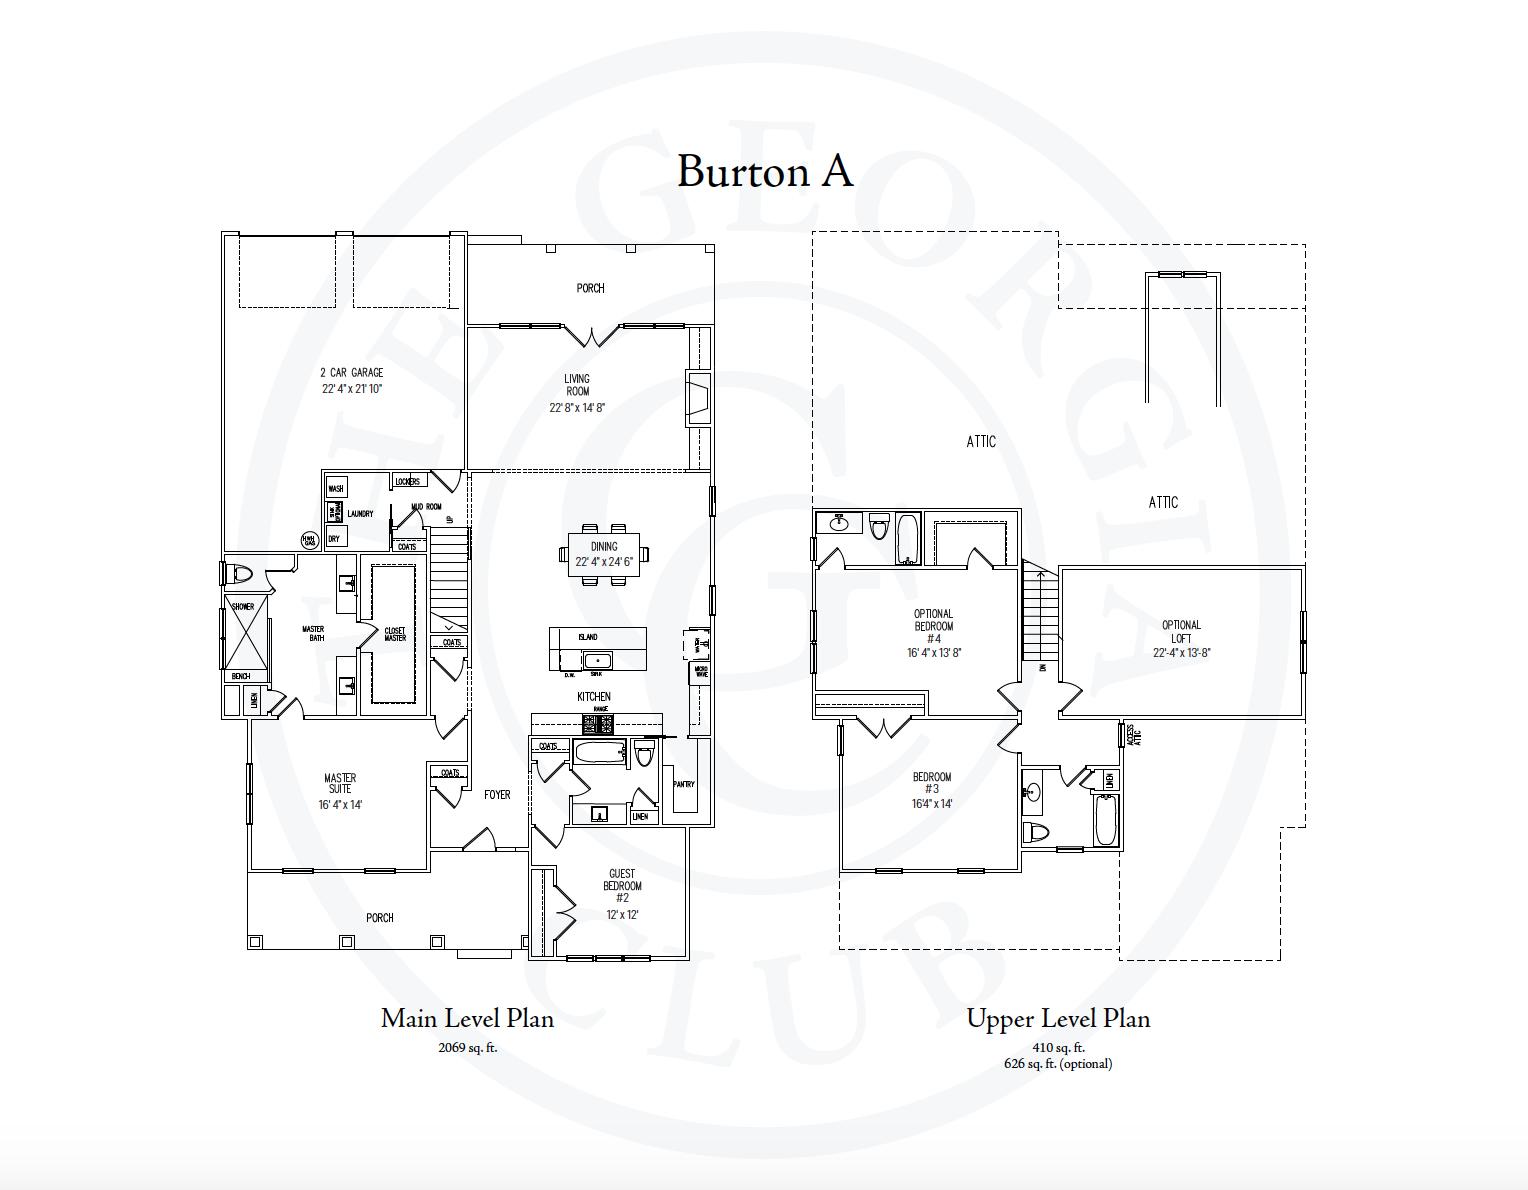 Burton A floor plan